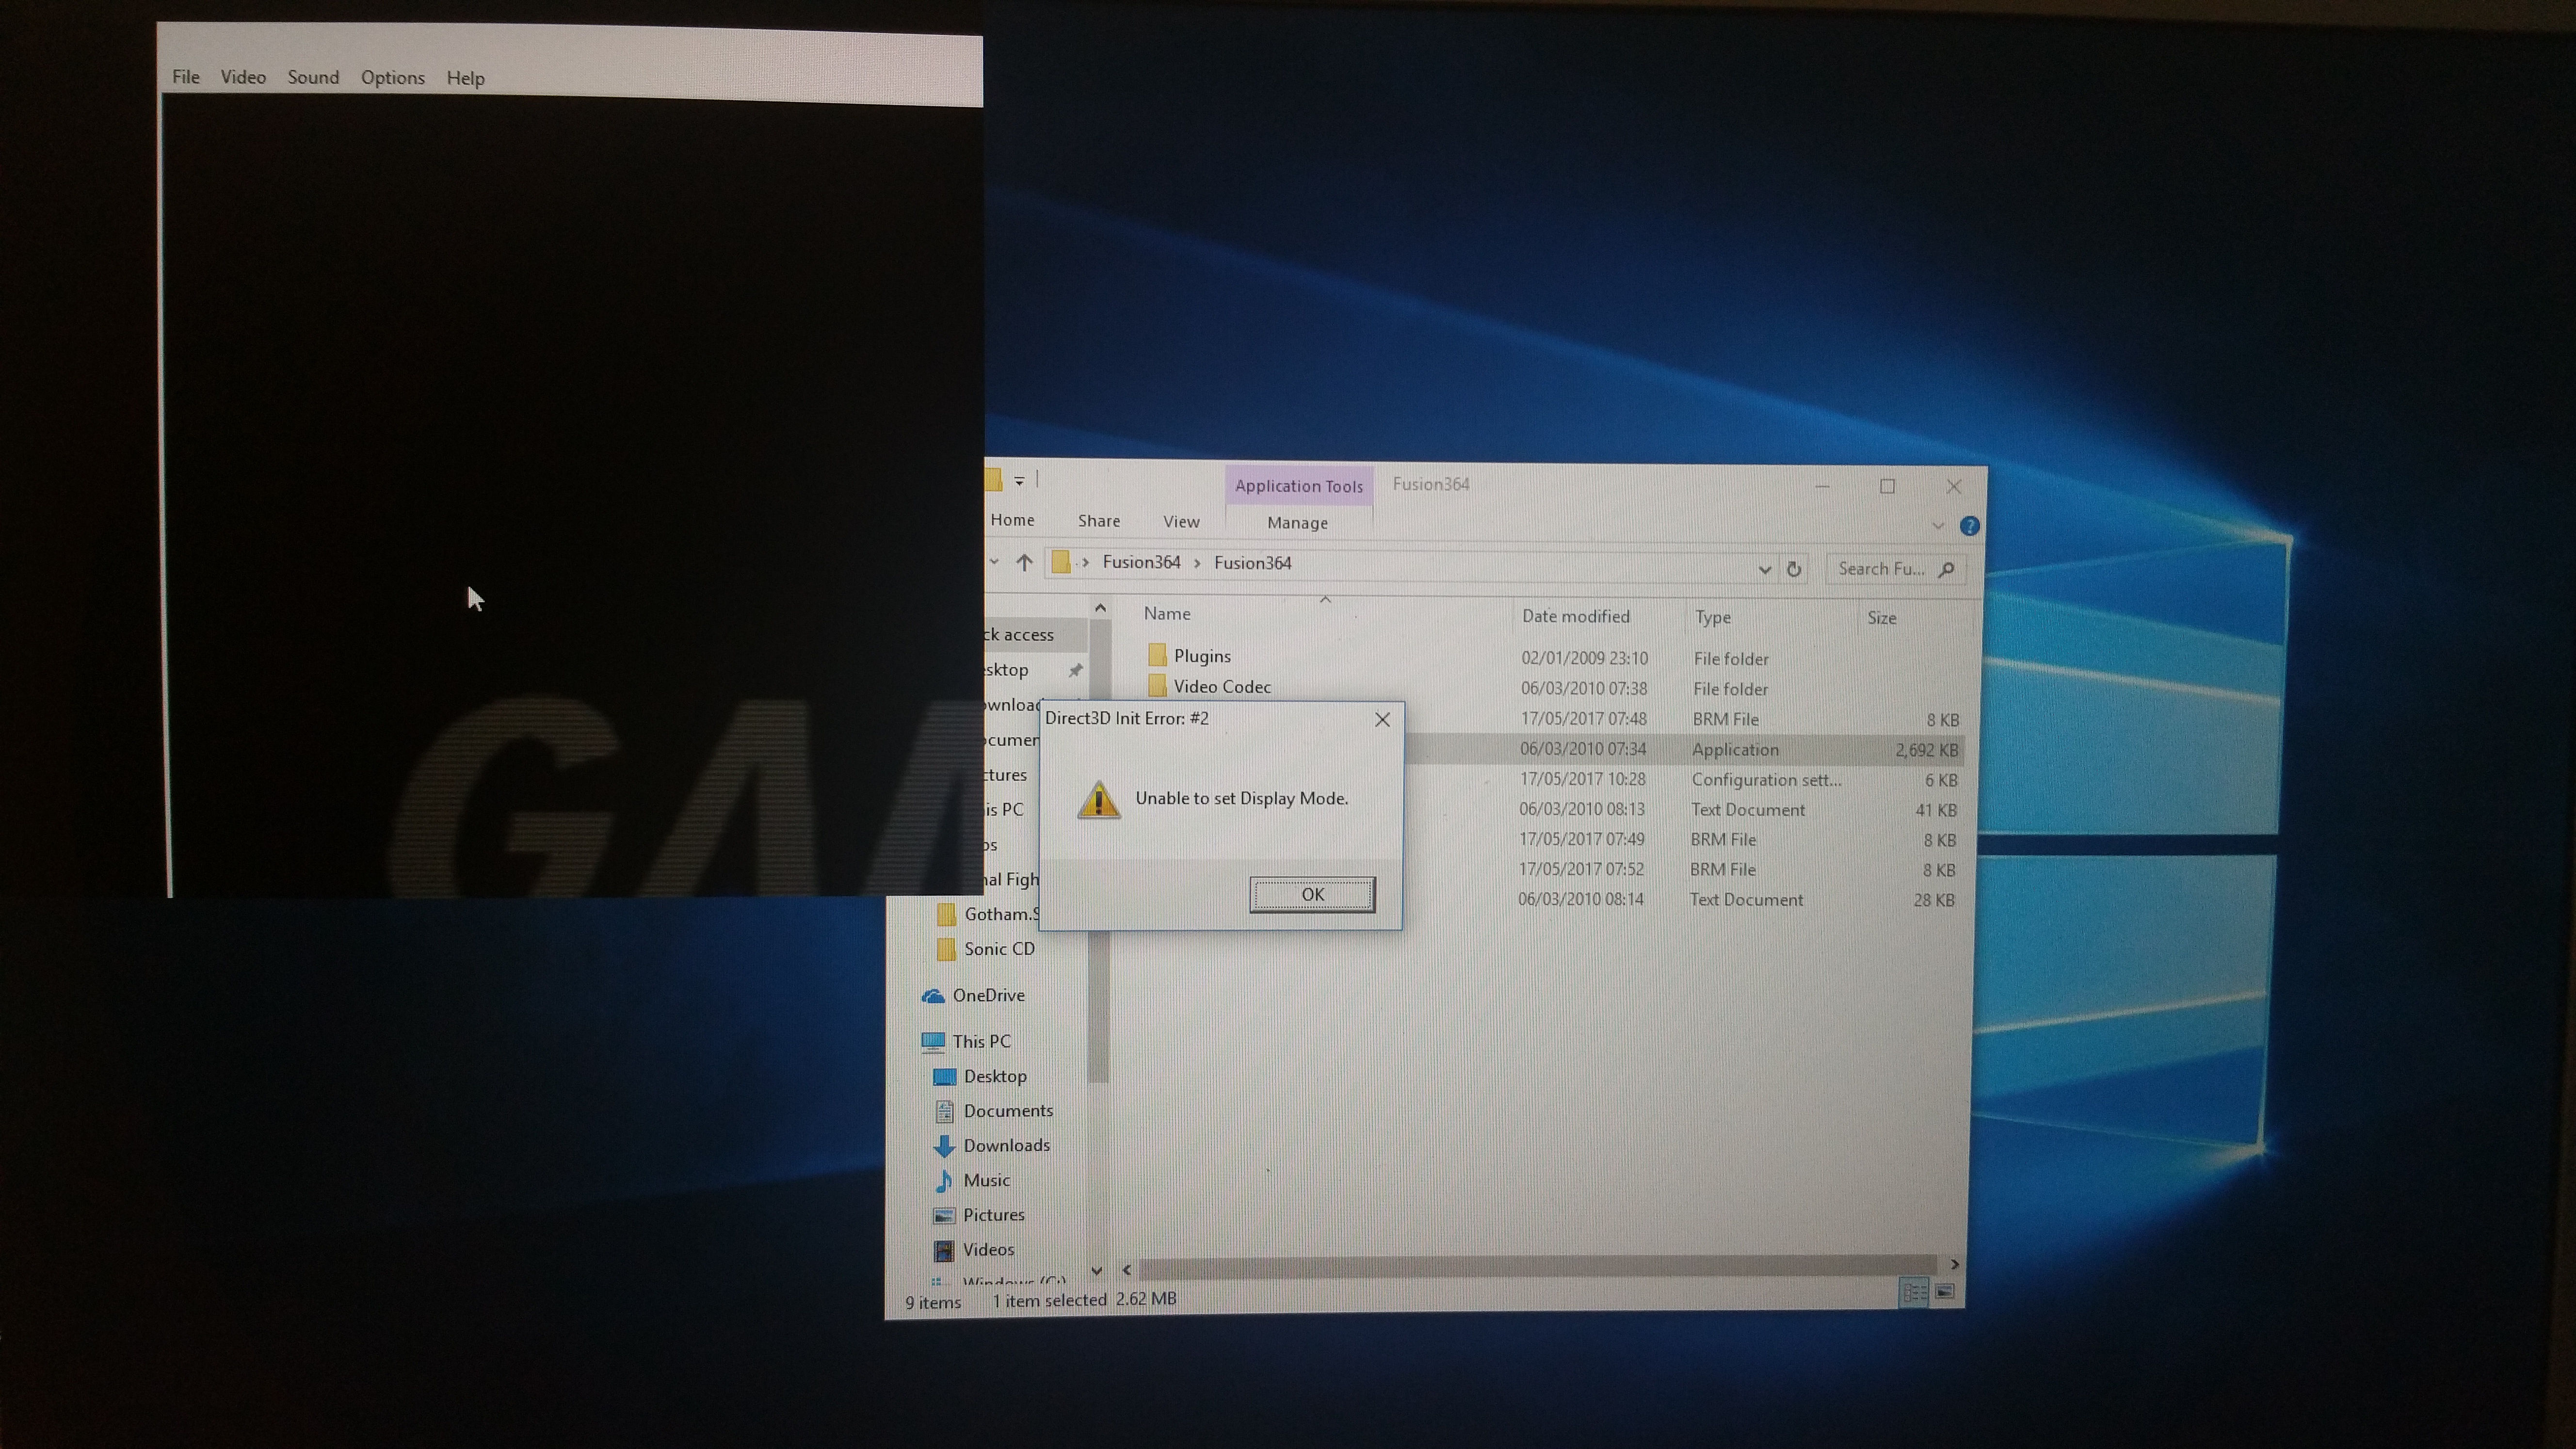 Kega fusion on windows 10 - Emulation - LaunchBox Community Forums